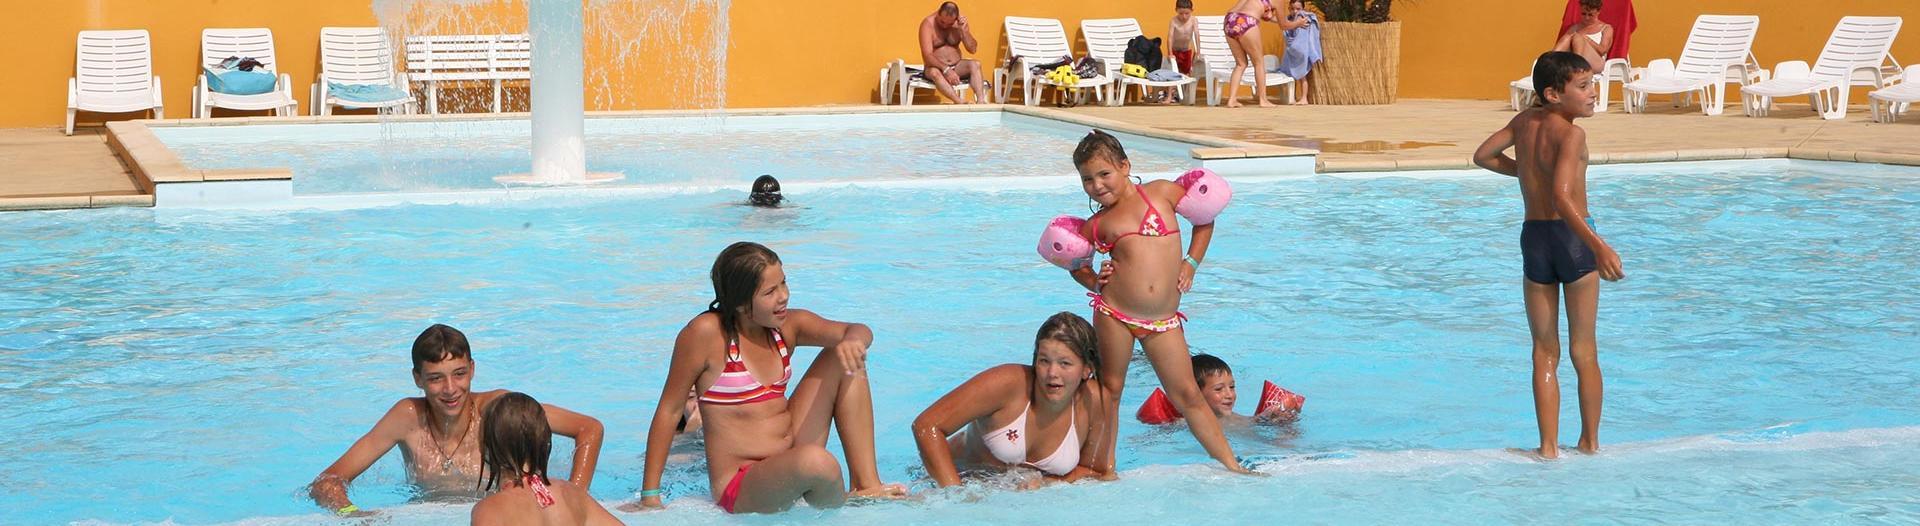 slider-camping-bel-air-olonne-piscine